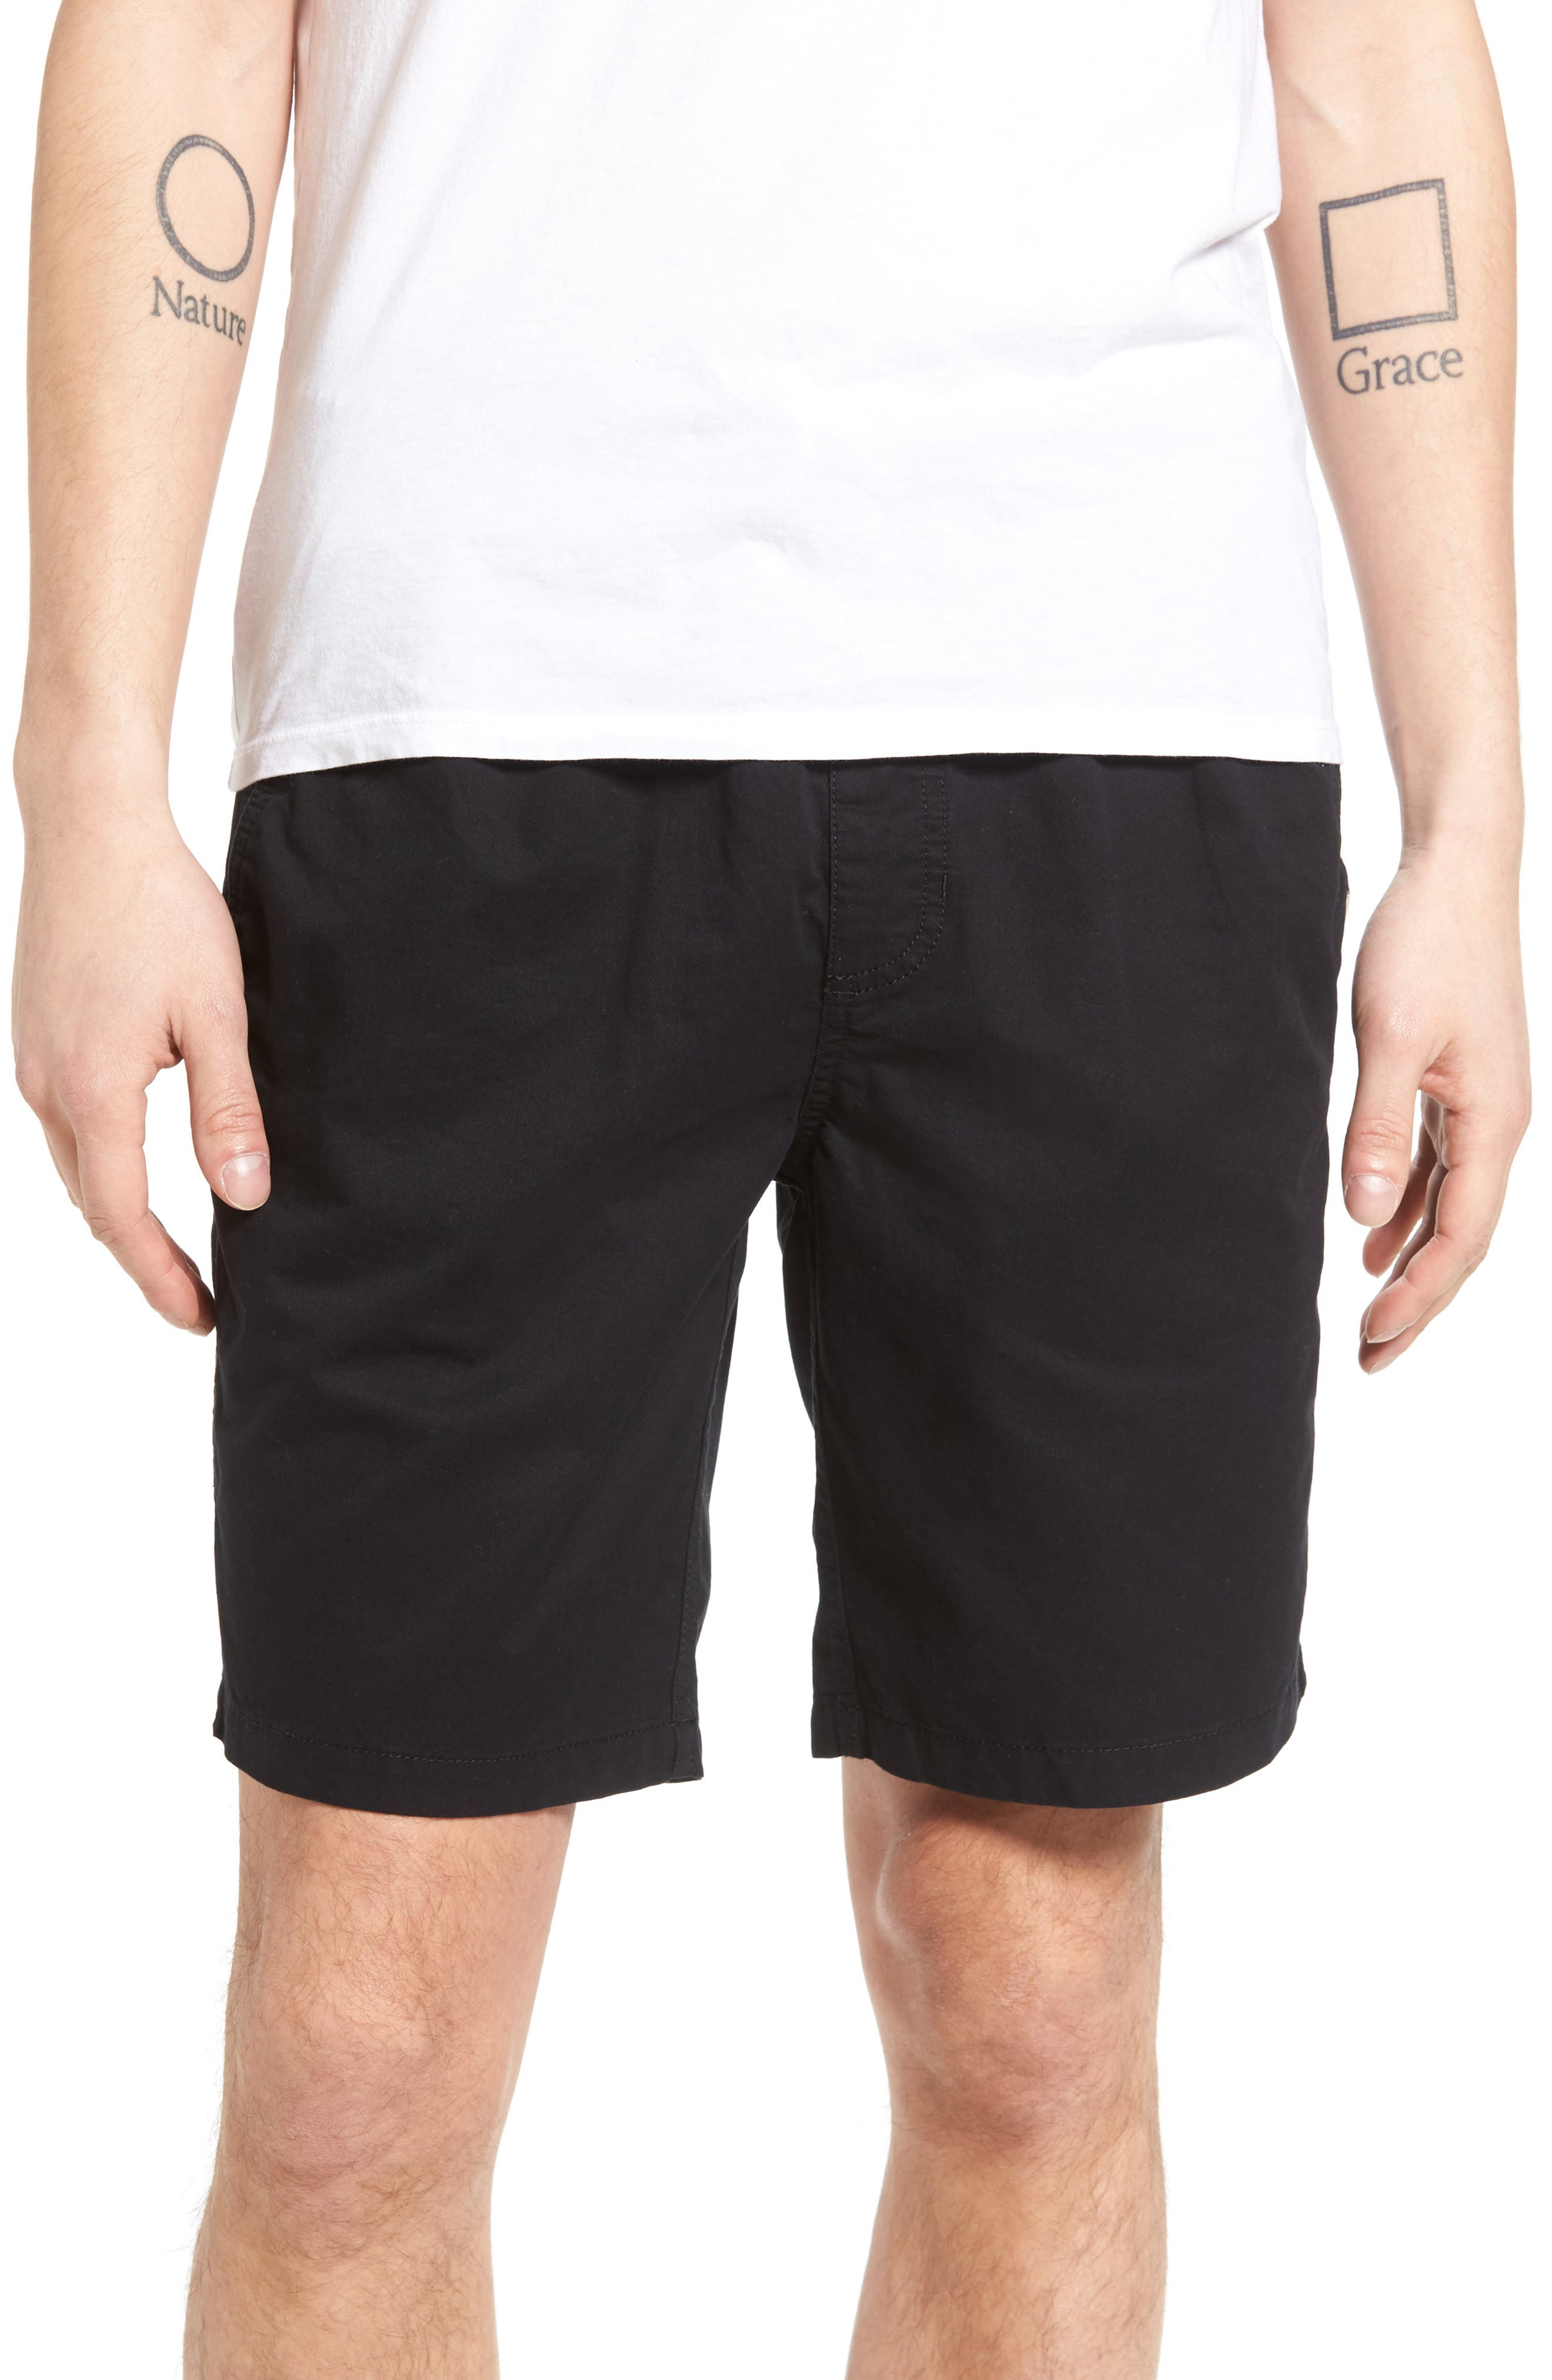 Range Shorts,                         Main,                         color,